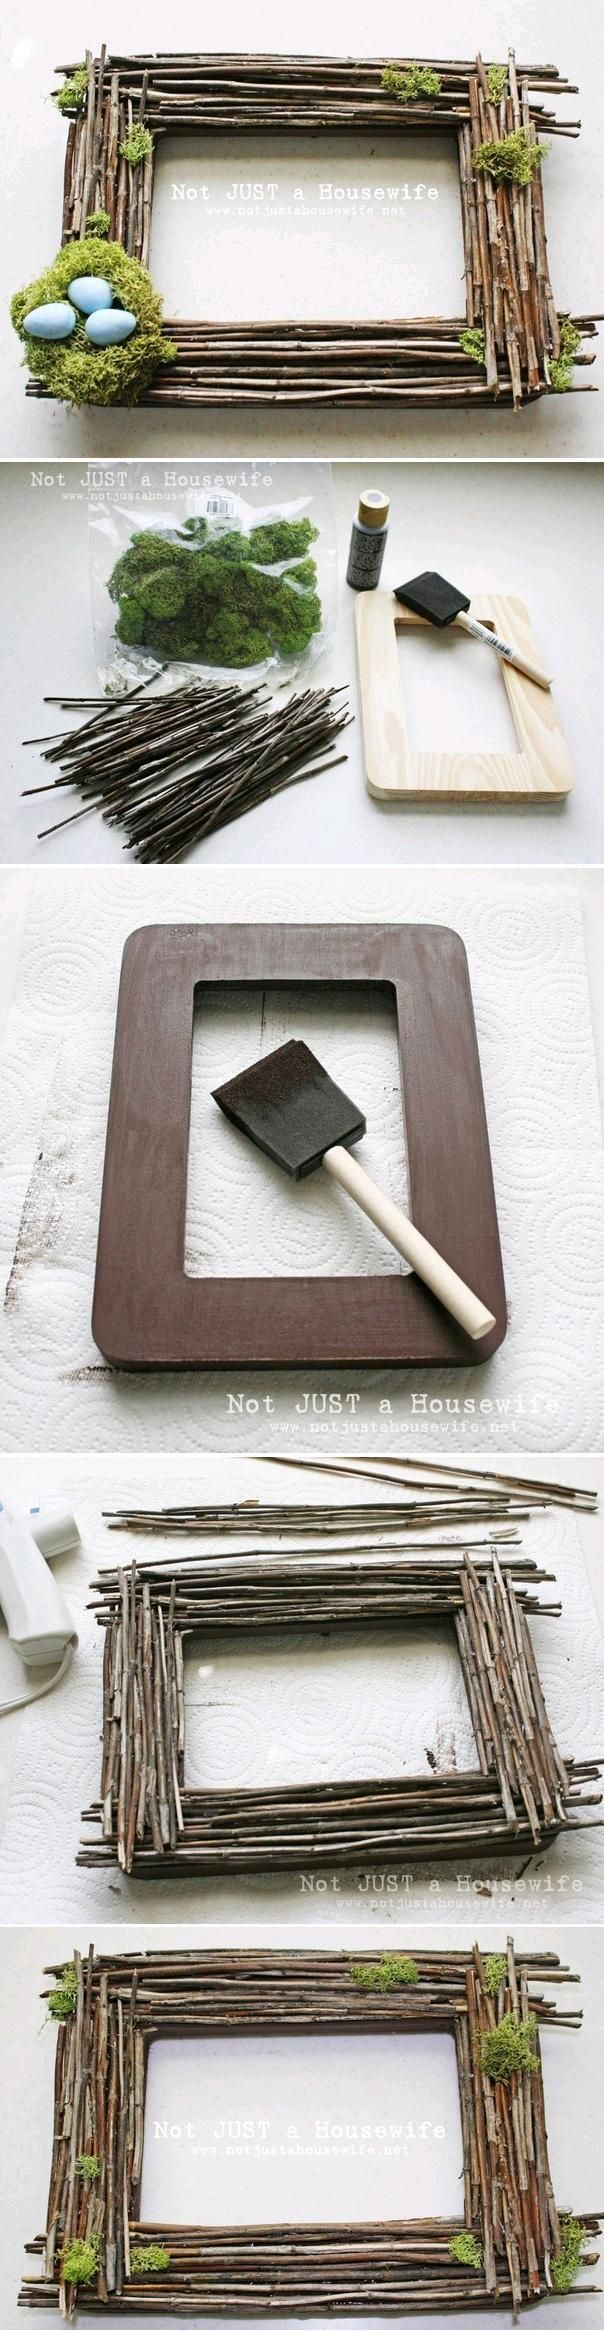 diy, diy projects, diy craft, handmade, diy ideas, diy spring frame